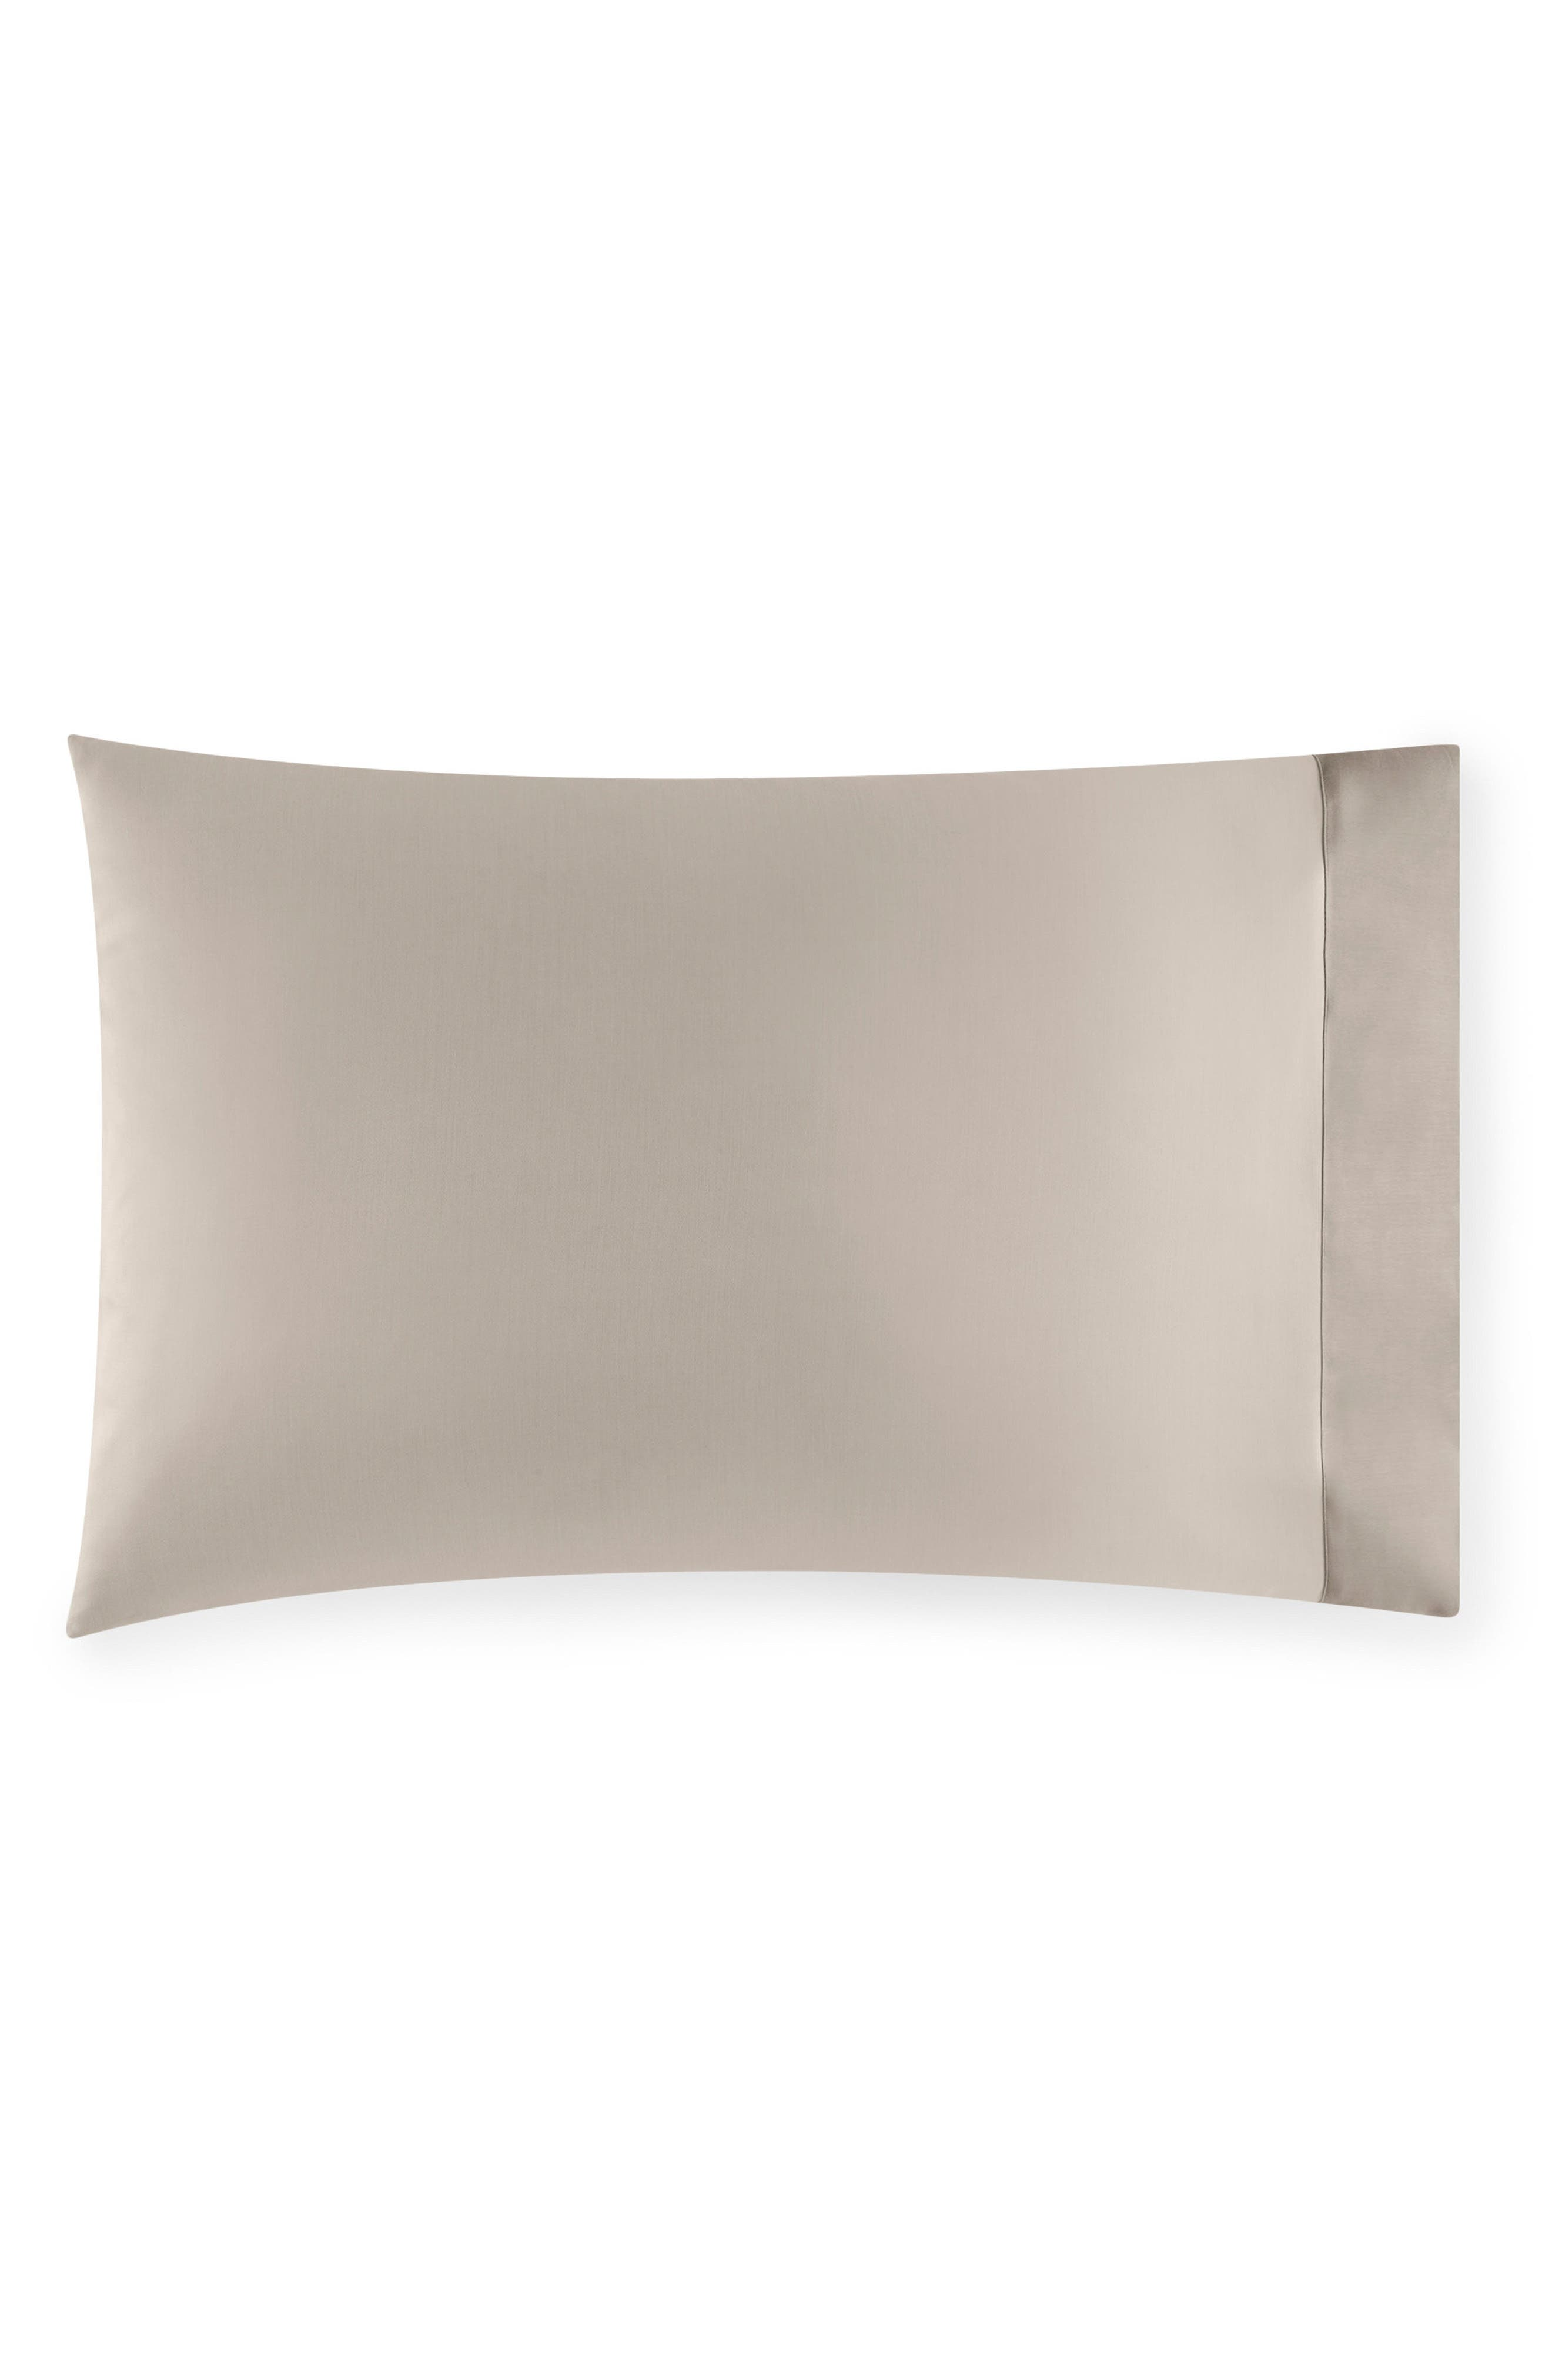 Larro Pillowcase,                         Main,                         color, NOUGAT